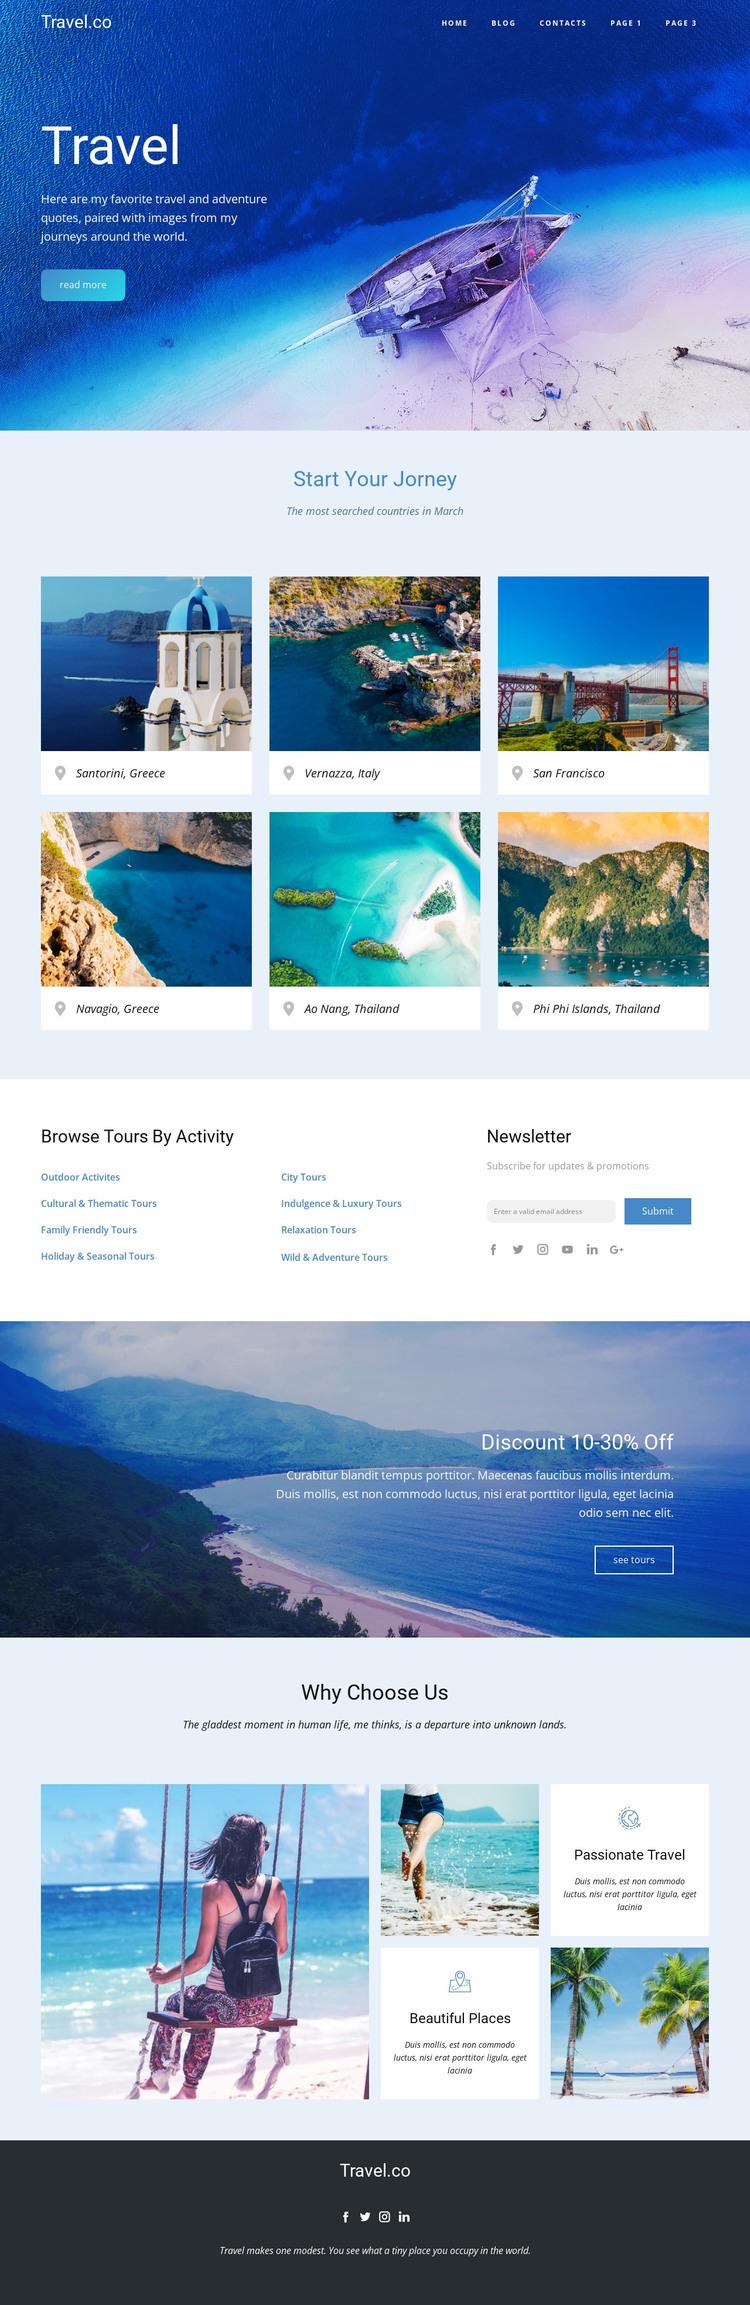 Amazing ideas for travel WordPress Theme